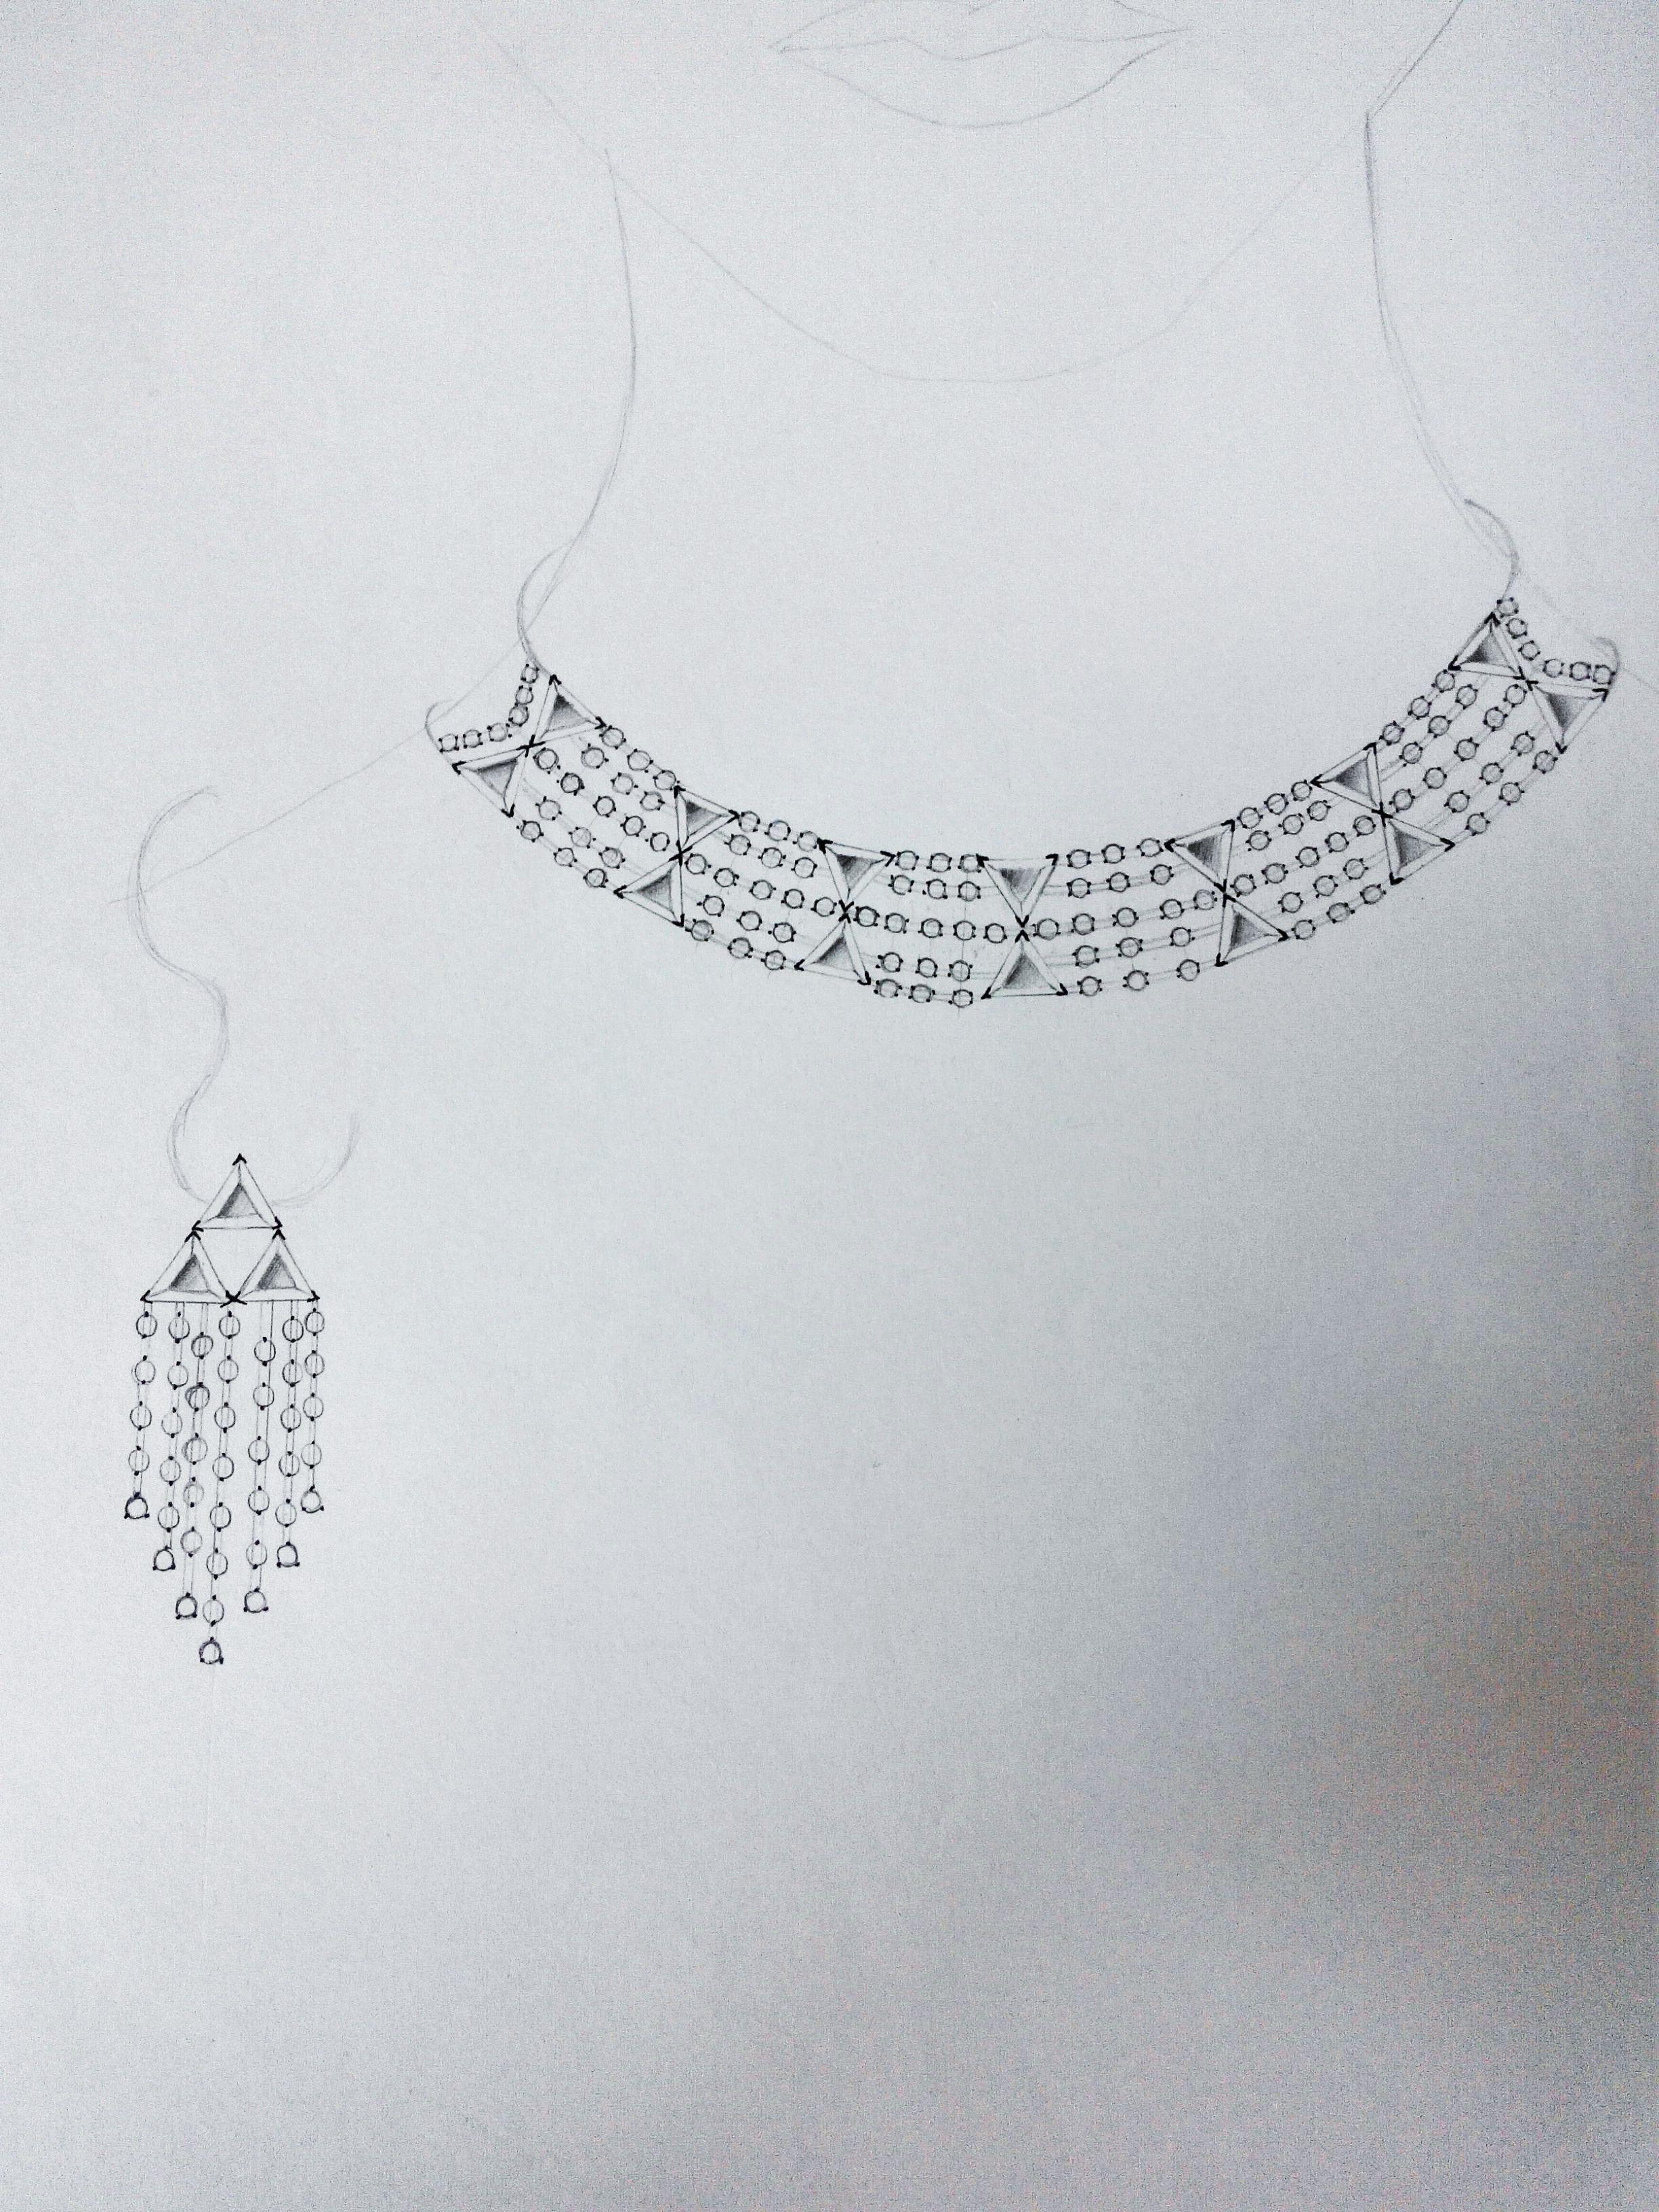 Jewelry design pencil sketch necklace